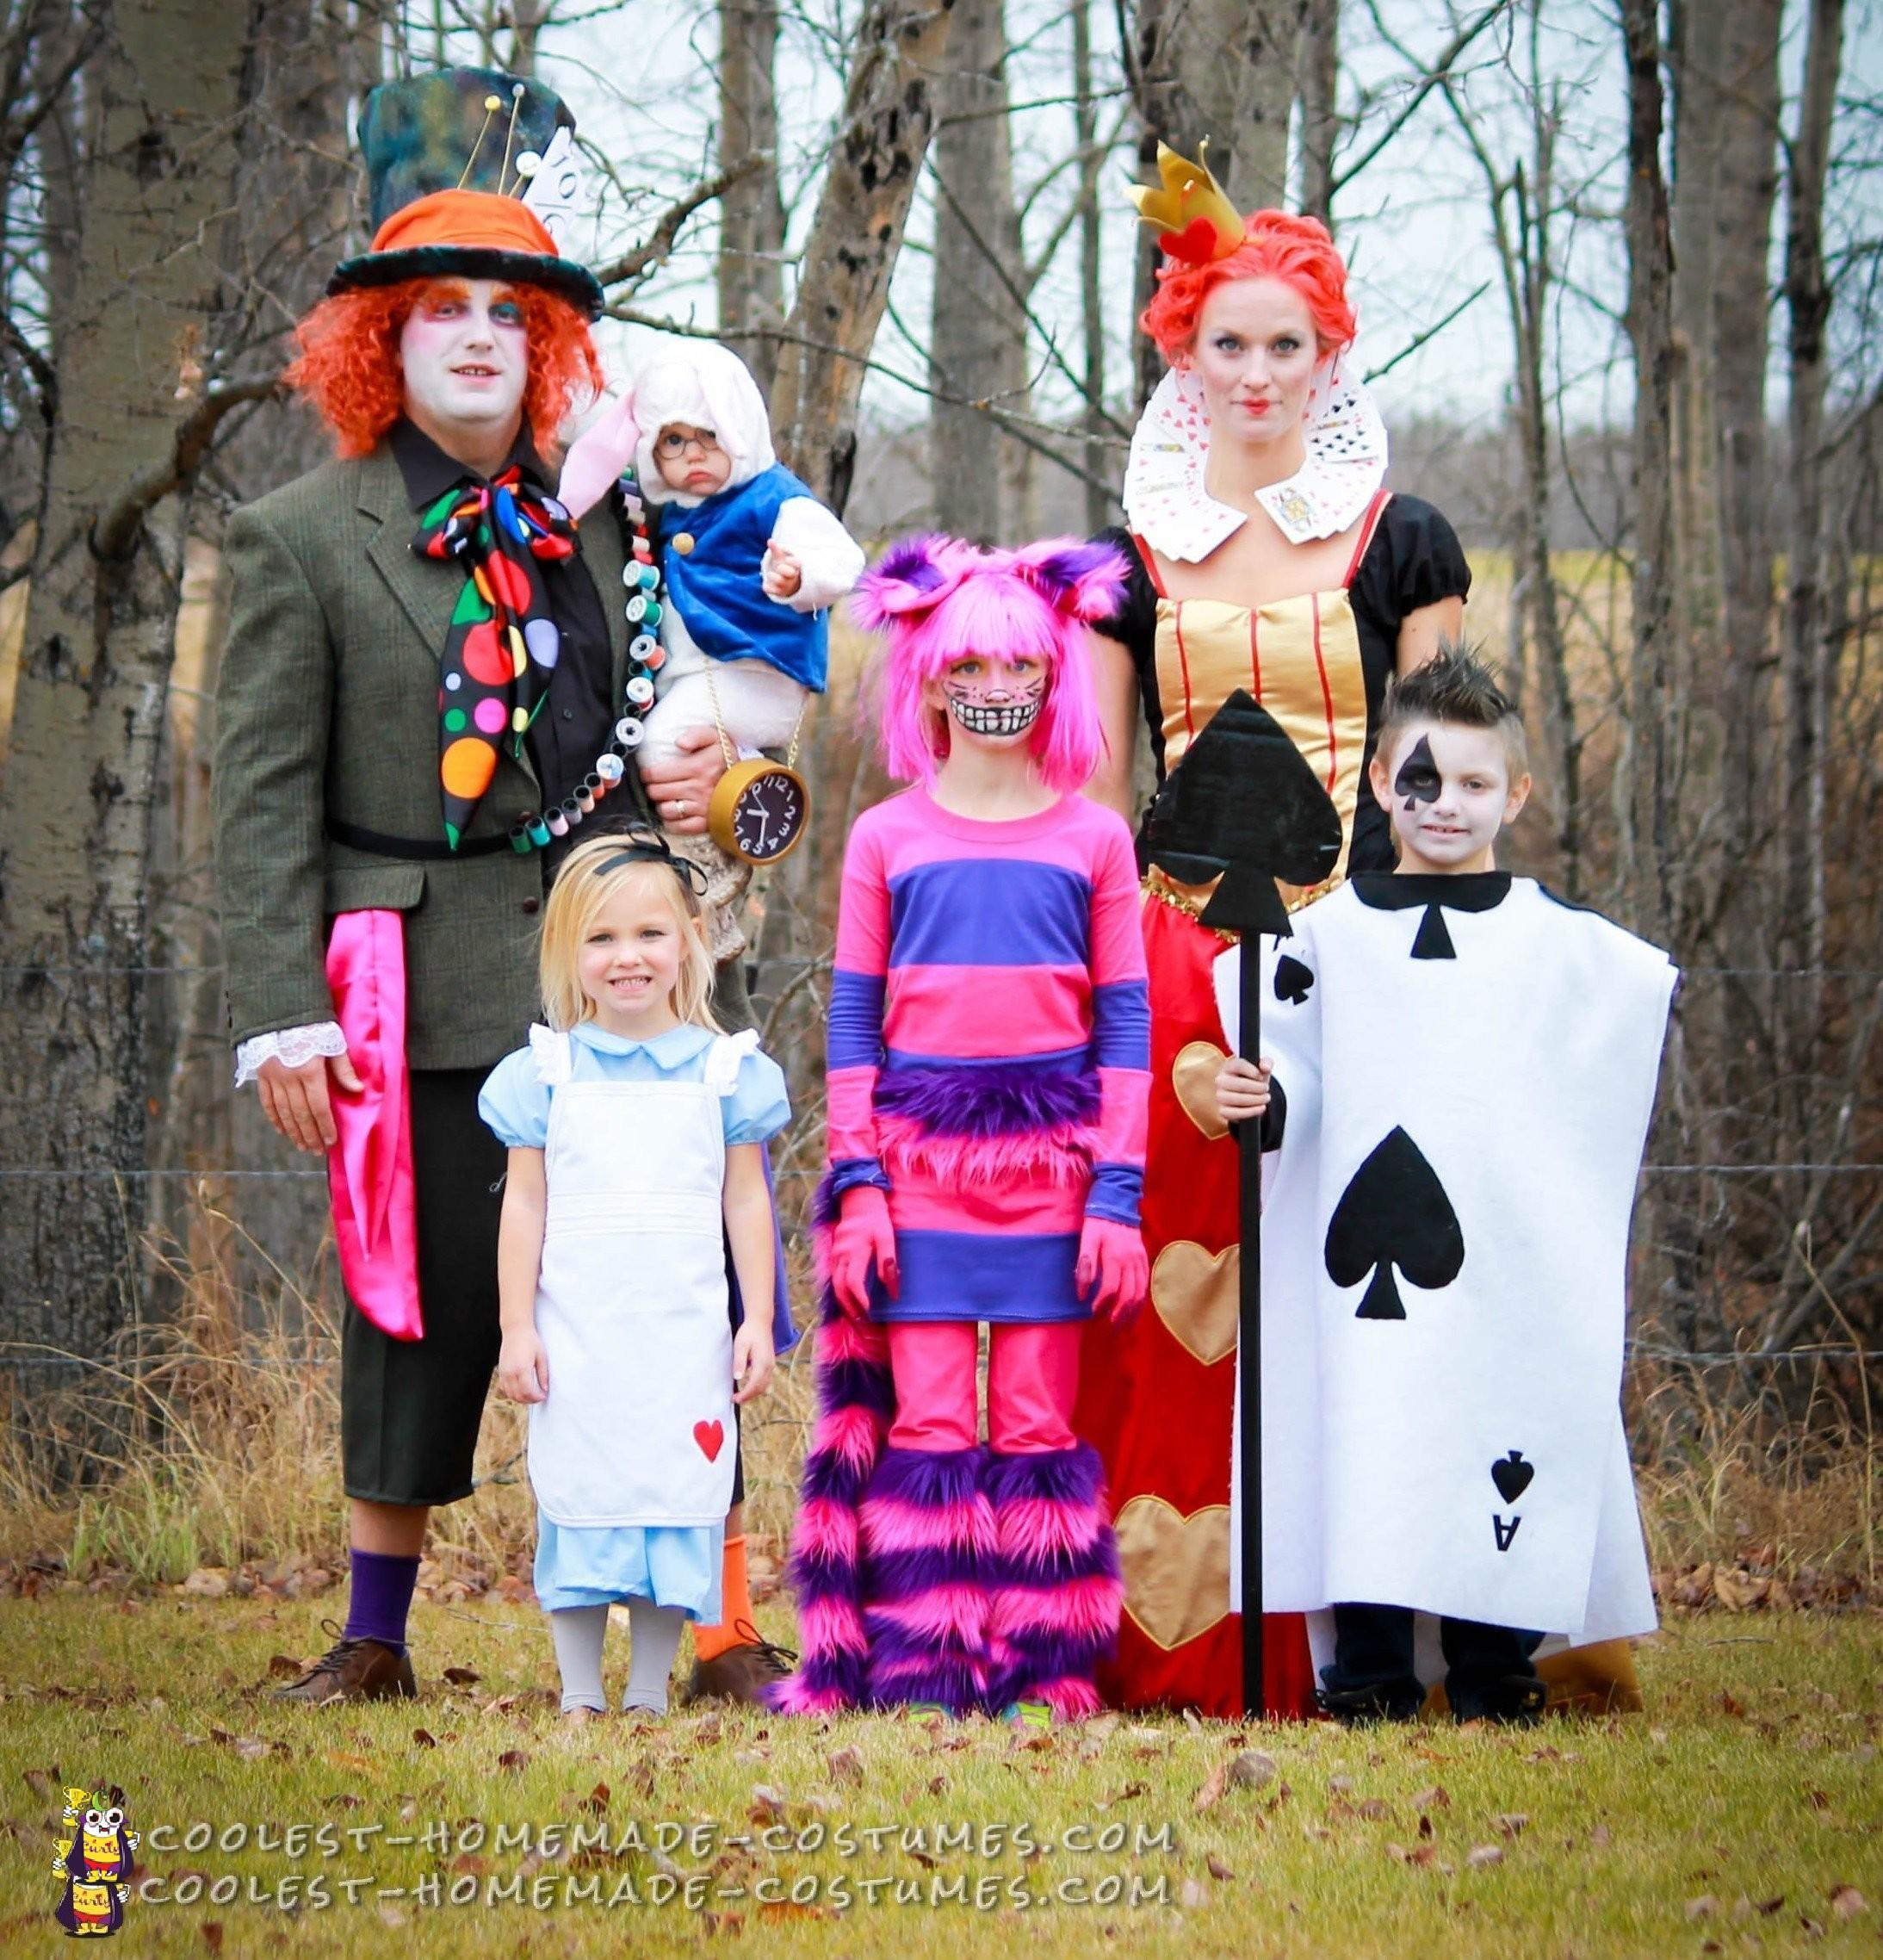 Alice In Wonderland Halloween Costume Family.Alice In Wonderland Family Costumes